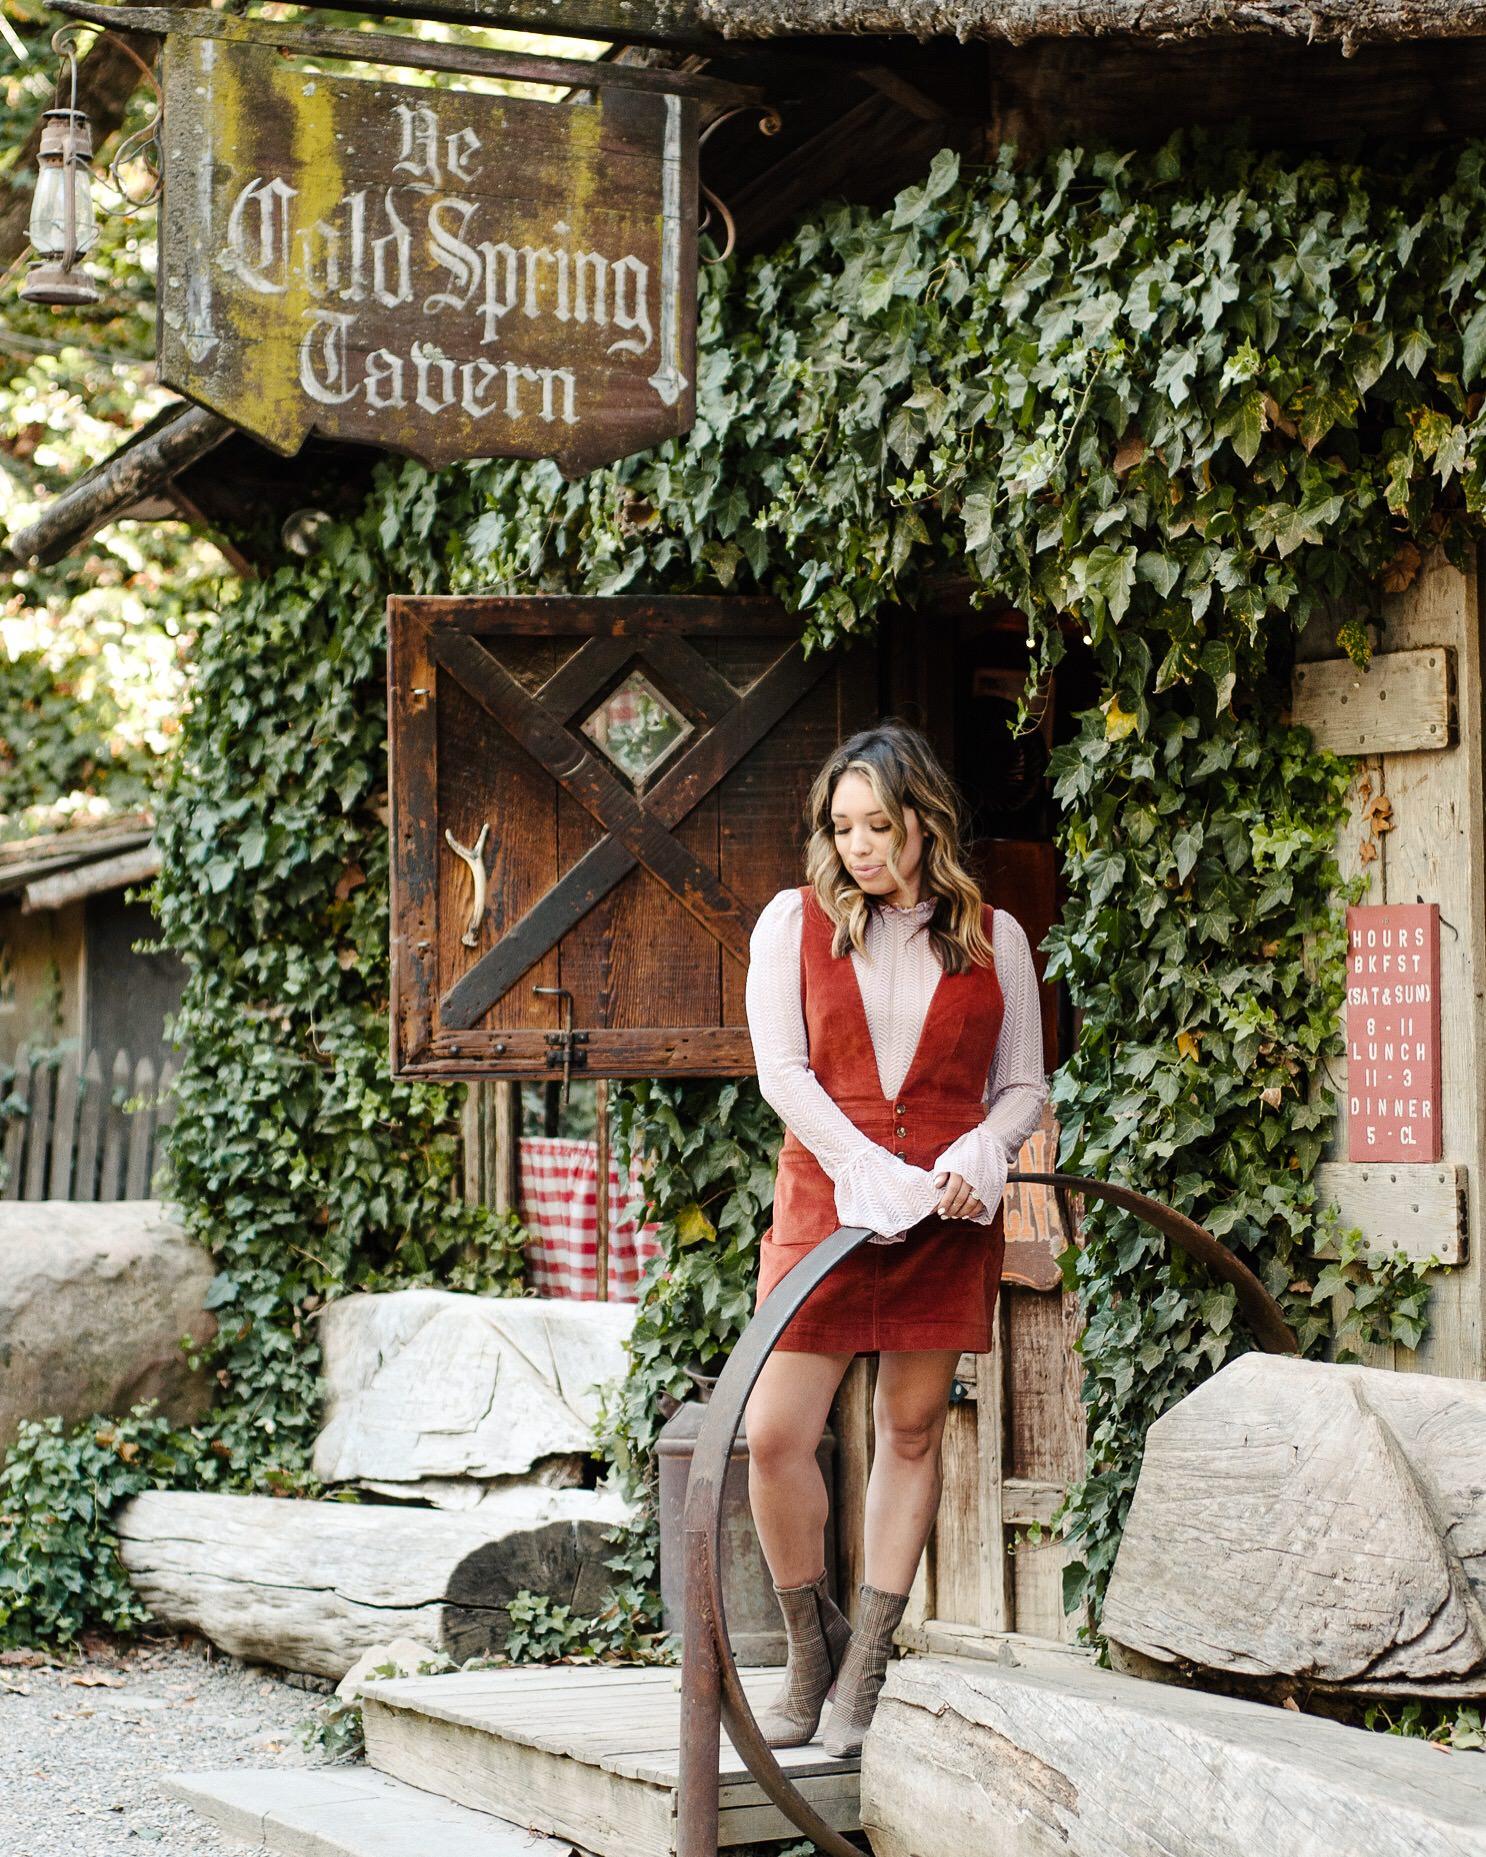 Cold Spring Tavern Santa Barbara Alex Riley Hola Marcia Free People Fashion Blogger Miranda Kelton Photography